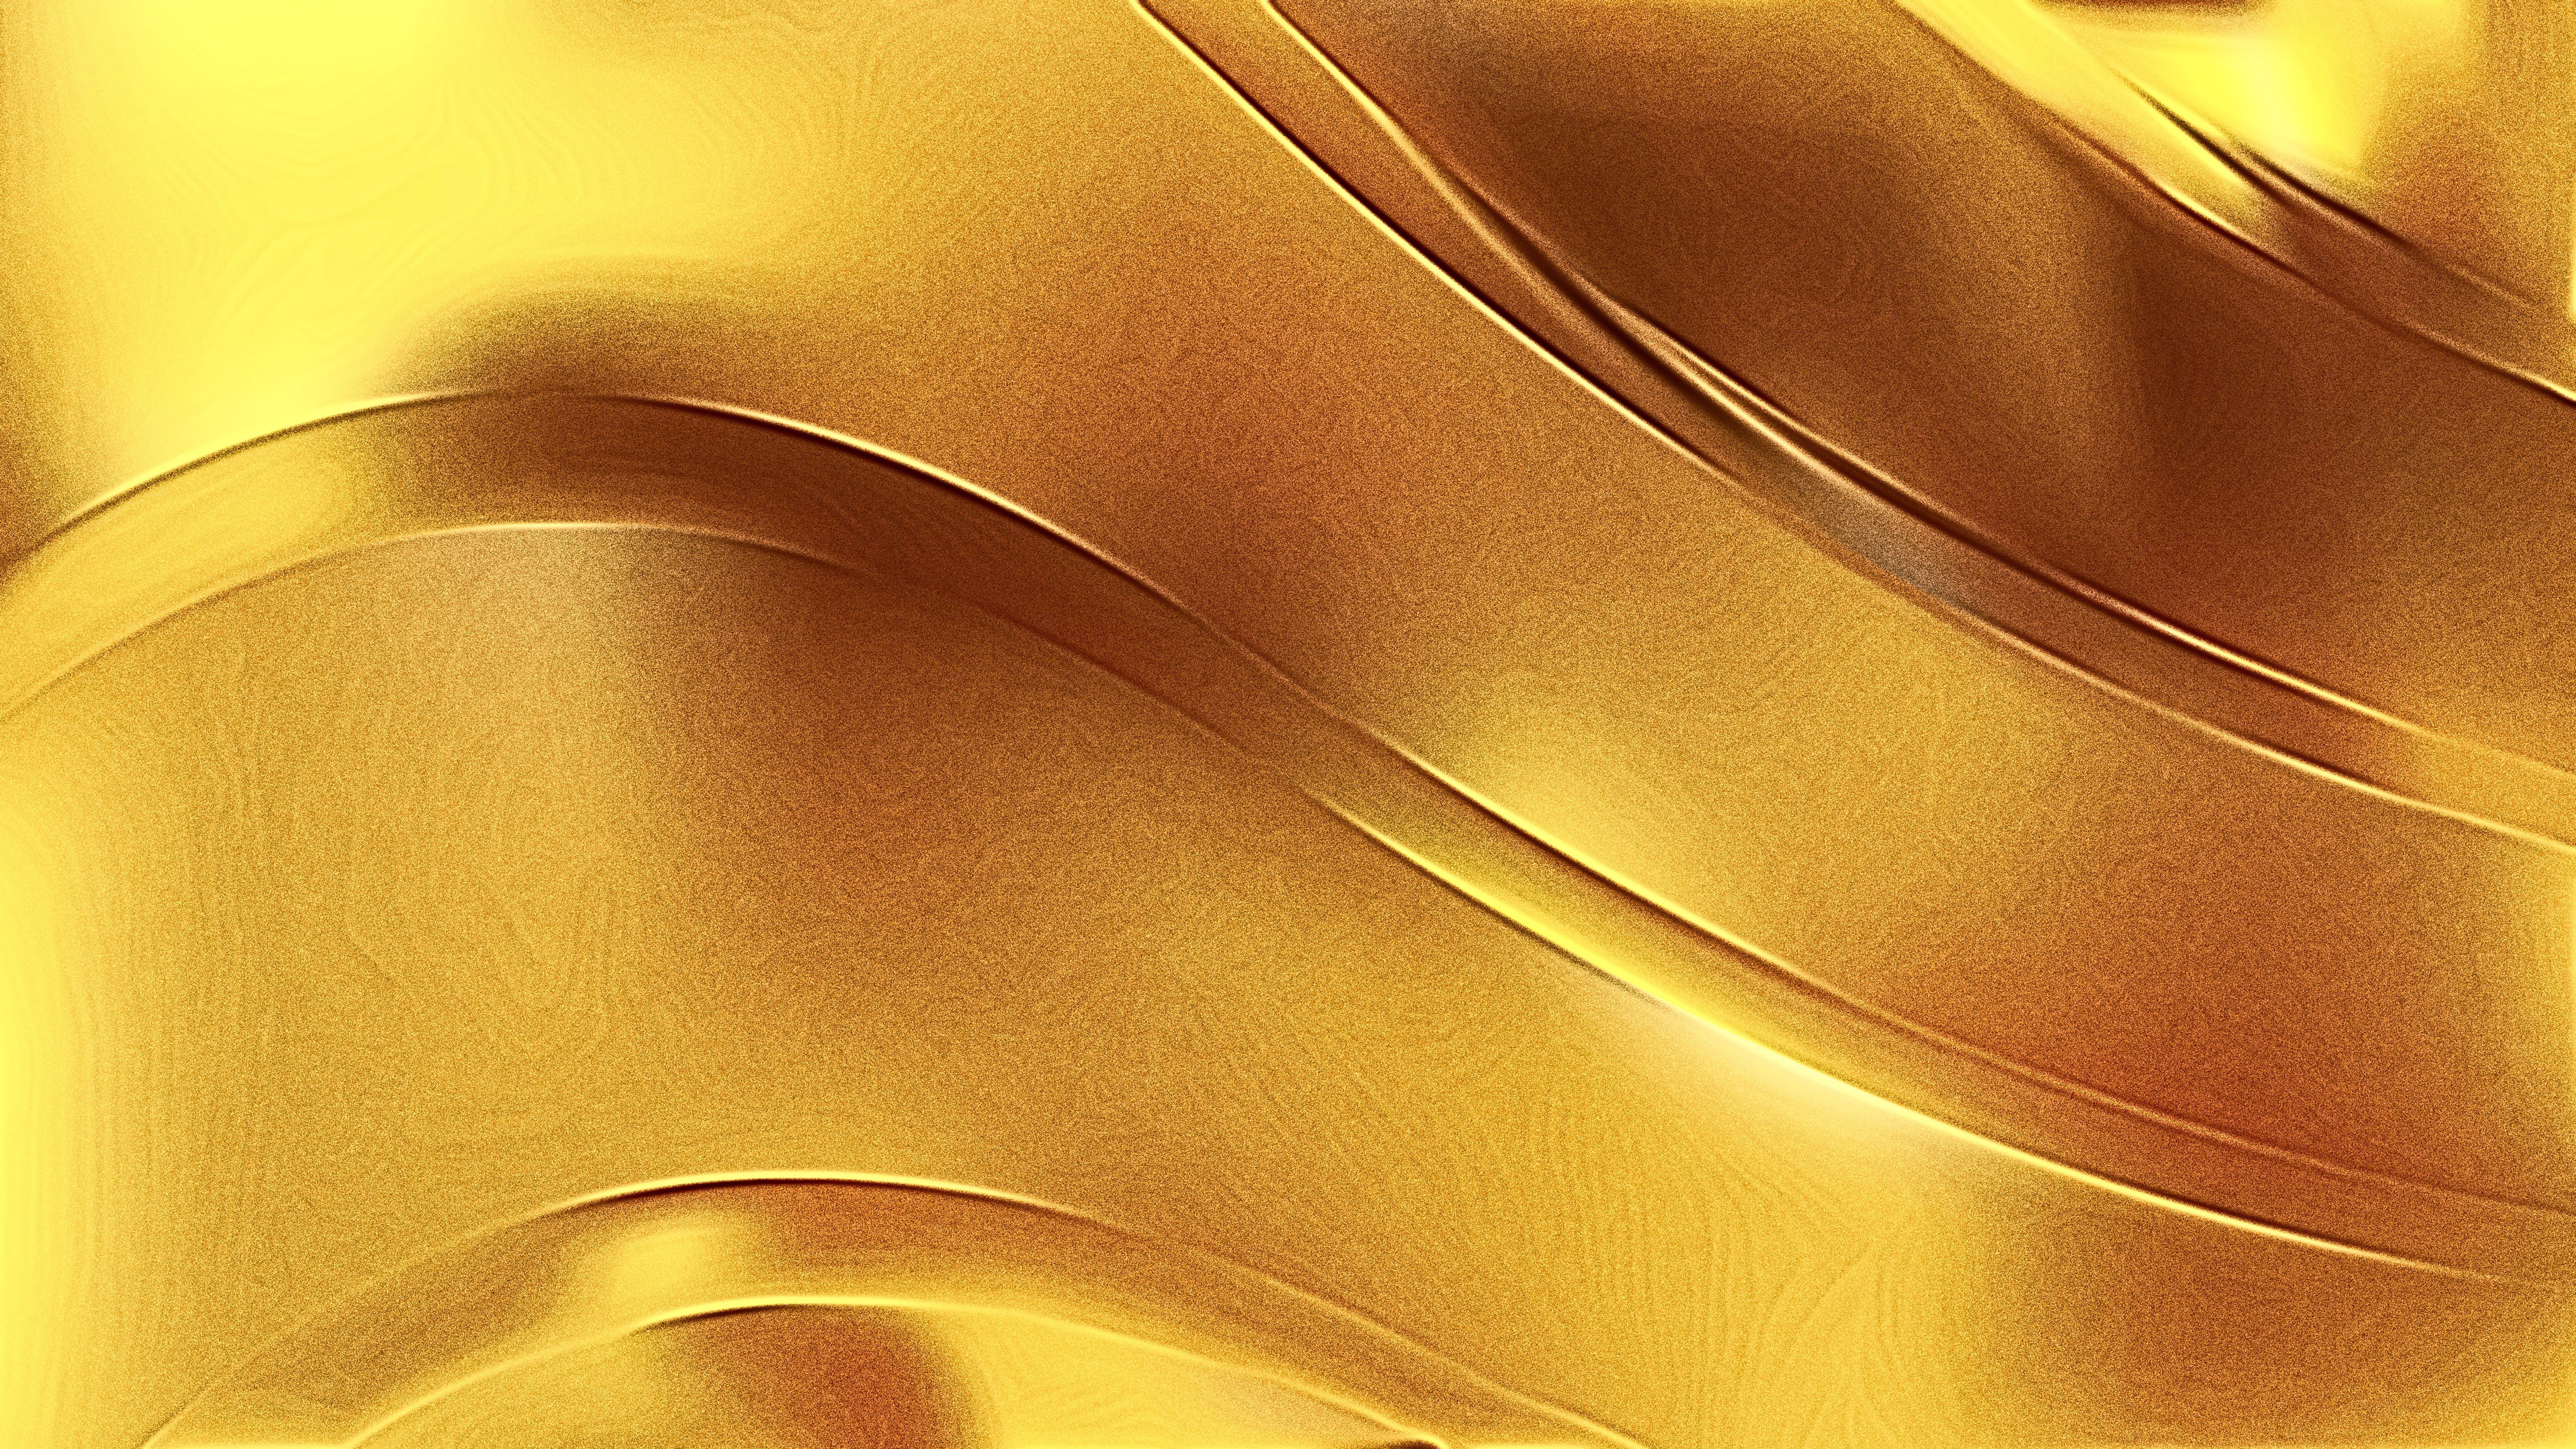 Gold Metallic Background Gold Metallic Background Metal Background Metal